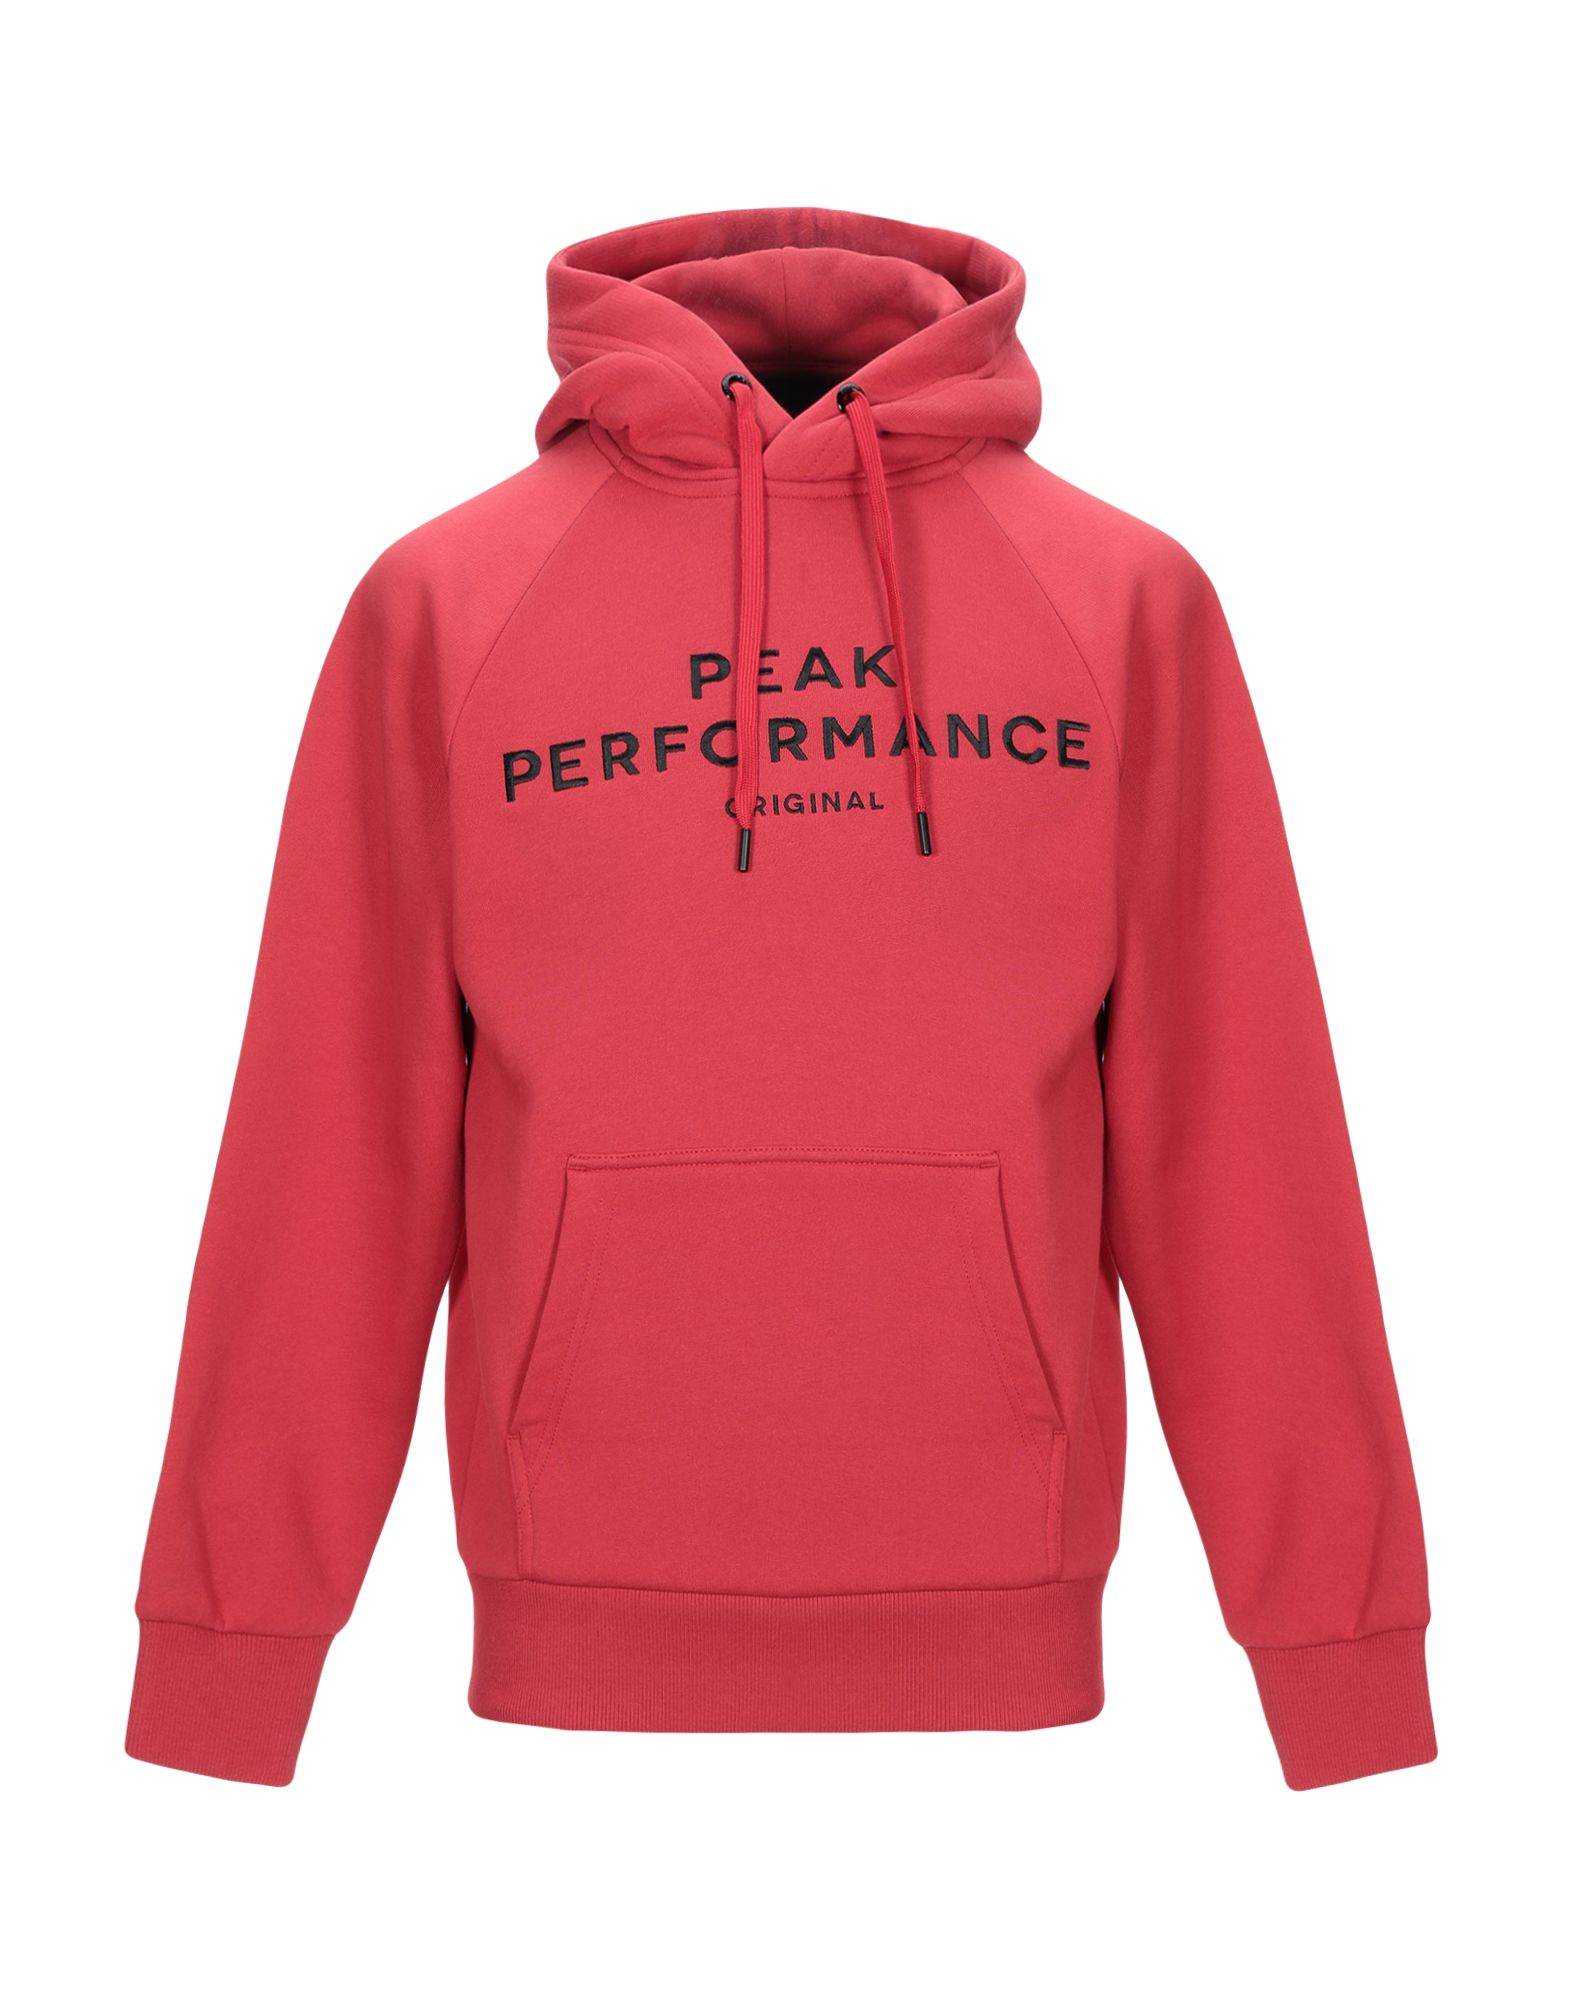 PEAK PERFORMANCE Толстовка толстовка peak performance peak performance lite c женская page 3